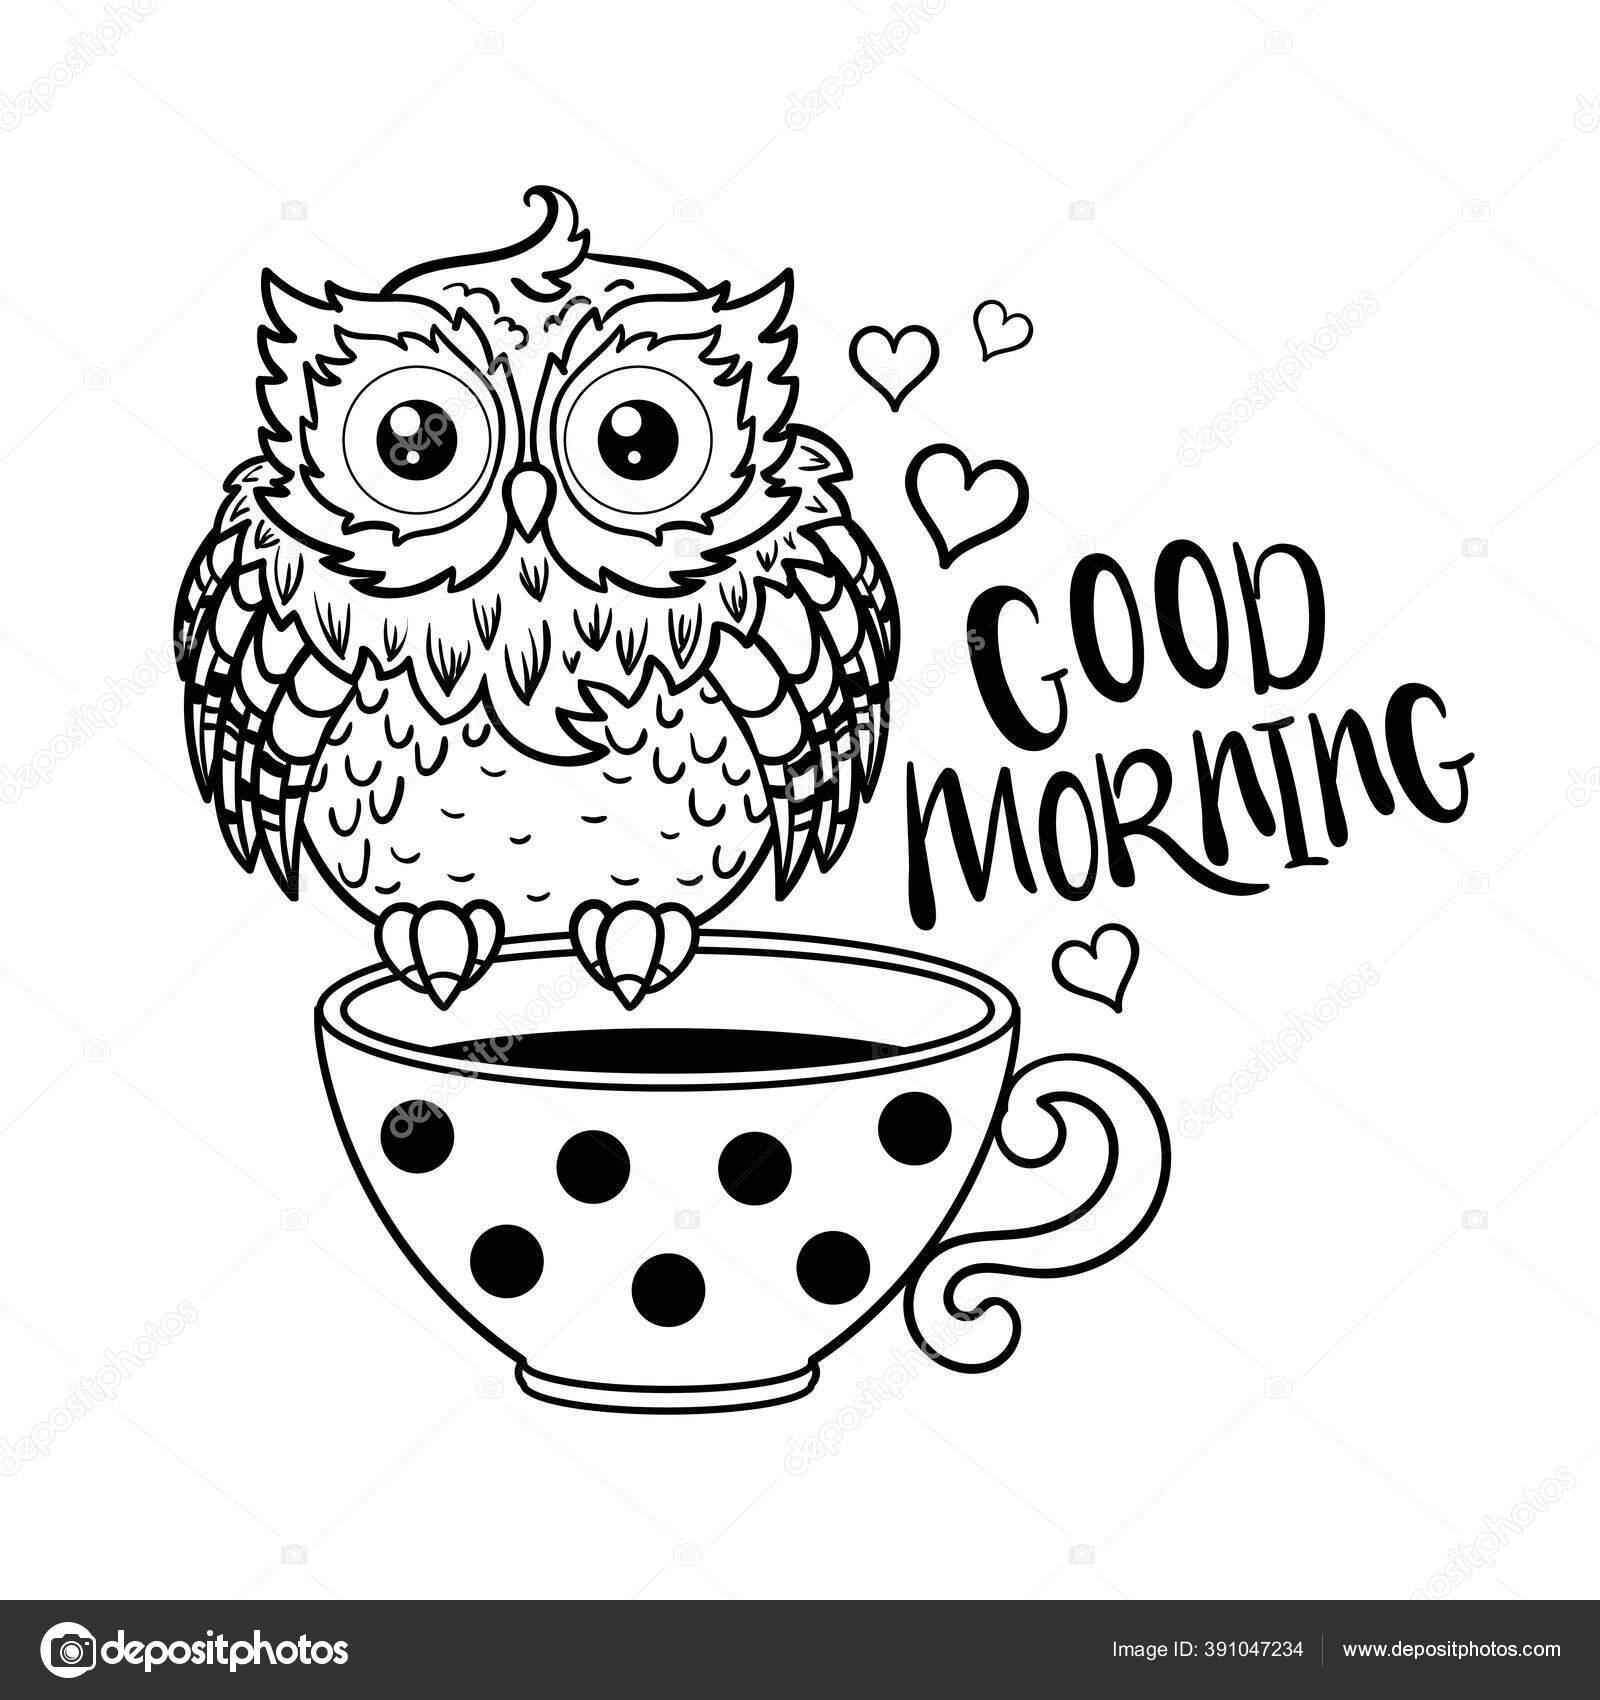 Lucu Burung Hantu Lucu Dengan Secangkir Kopi Karakter Kartun Garis Hitam Pada Latar Belakang Putih Vektor Stok Vektor C Zerlina 391047234